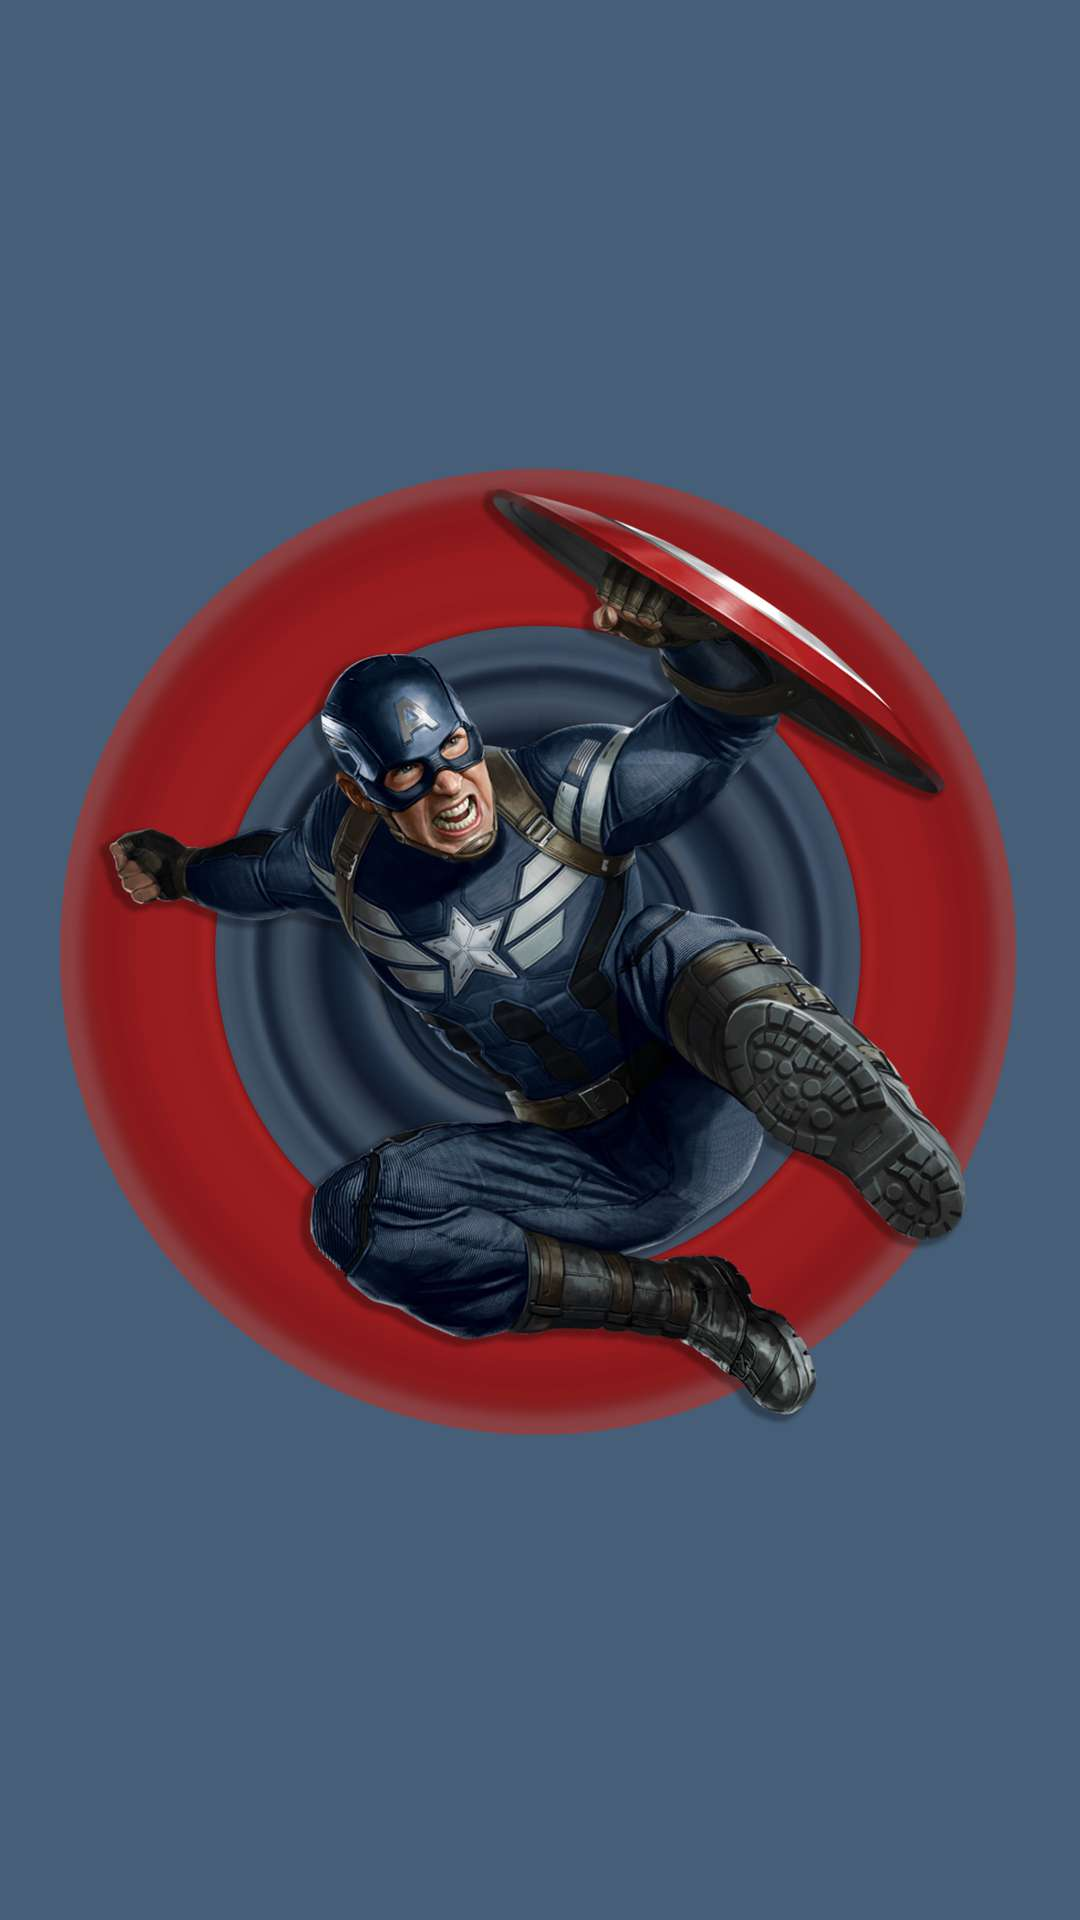 Captain America Endgame Action iPhone Wallpaper